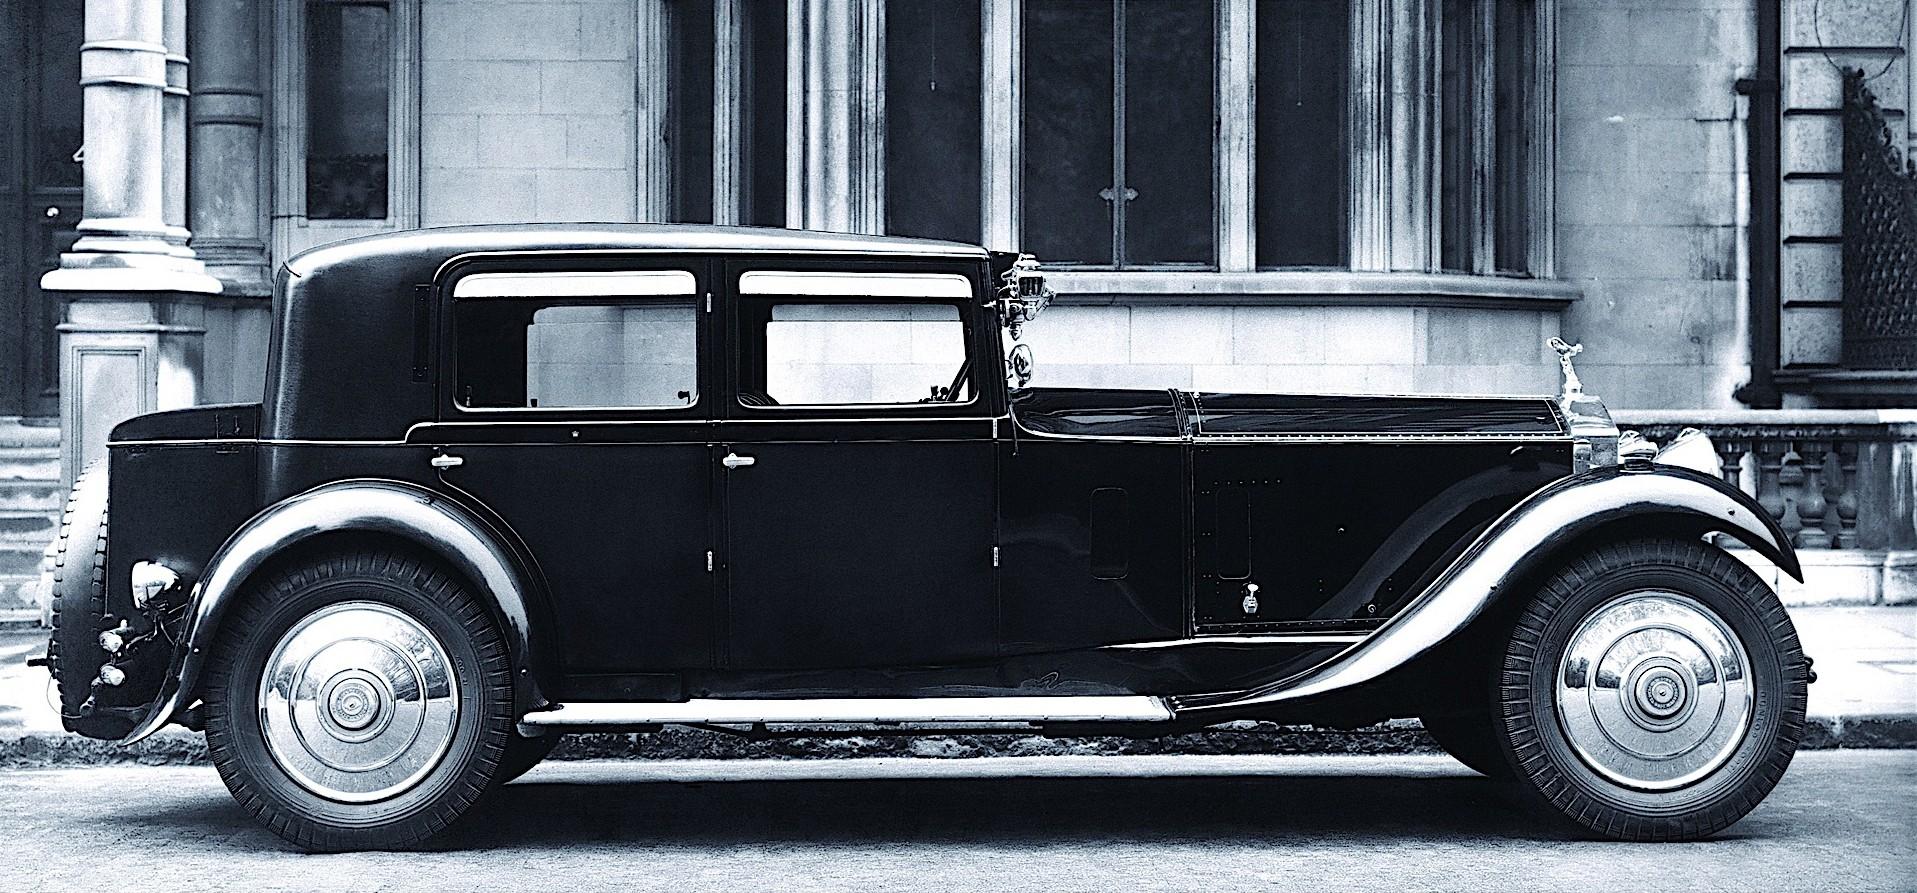 The Astonishing History Of The Rolls Royce Phantom